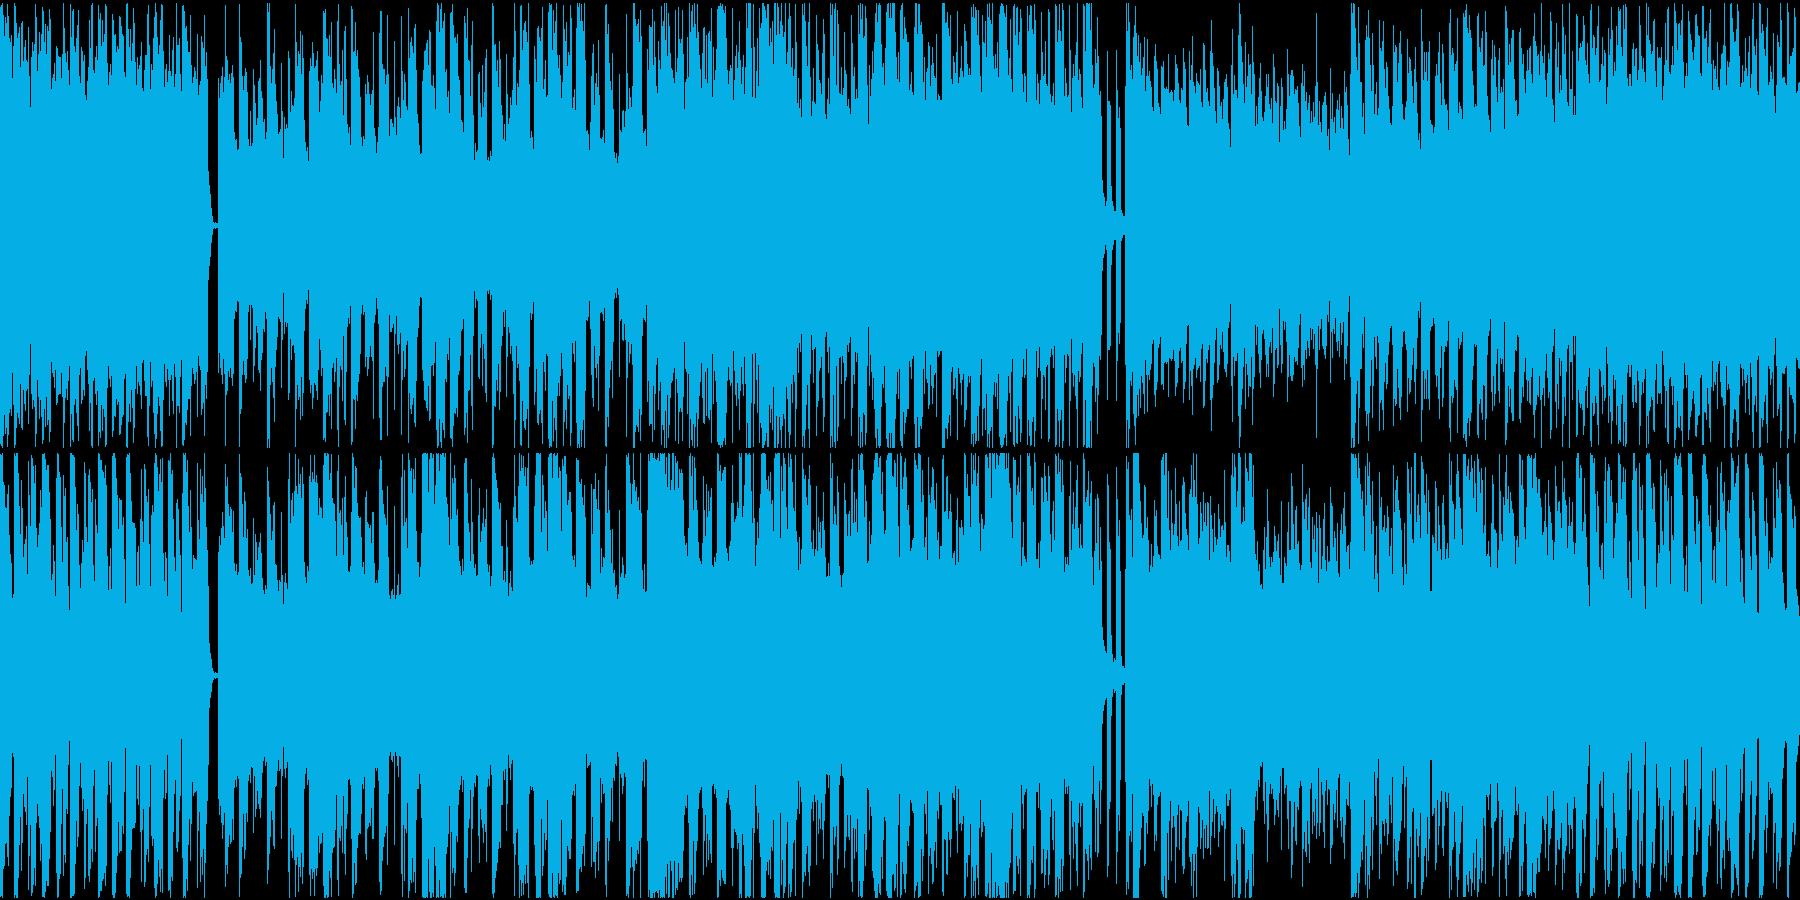 EDM要素を含む戦闘BGMの再生済みの波形